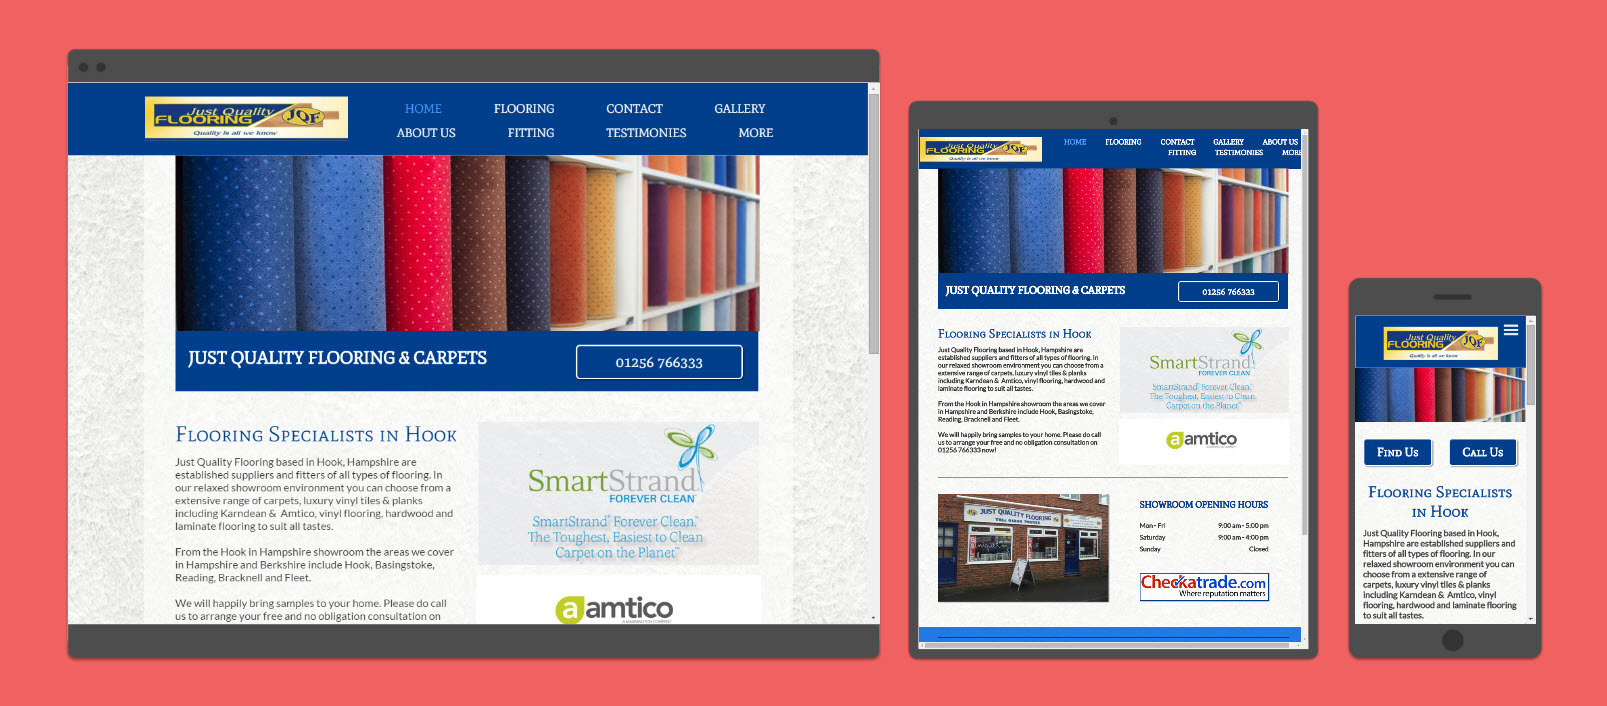 Mobile or Smartphone Friendly Websites